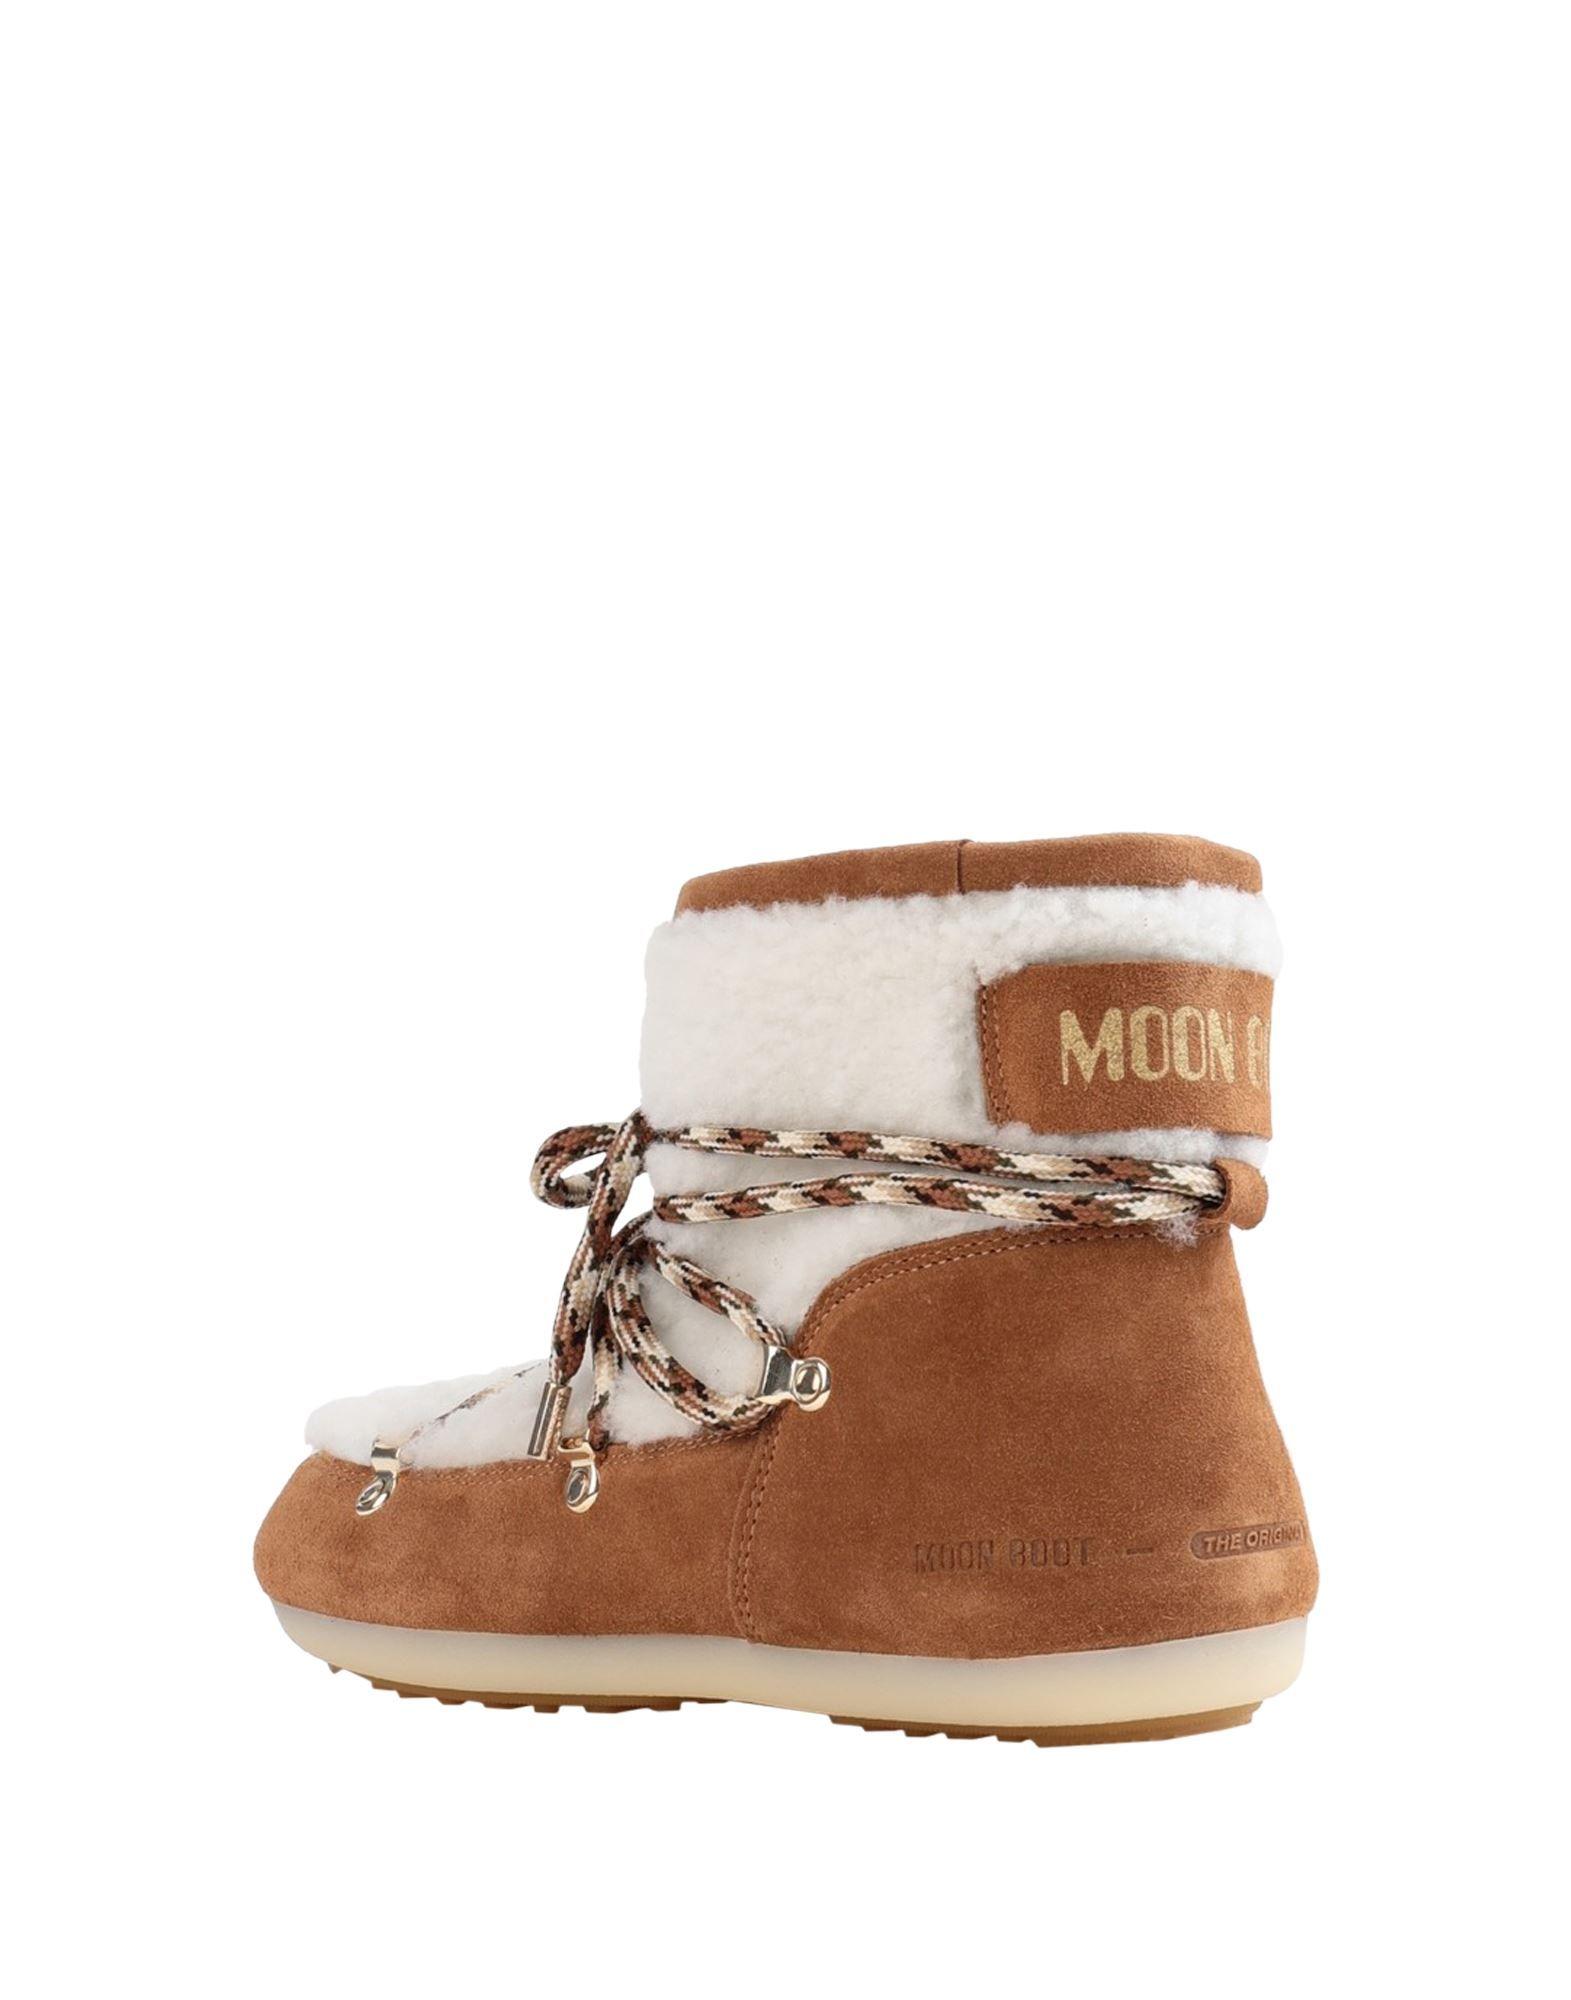 Moon Boot Women's Ankle Boots Camel Sheepskin